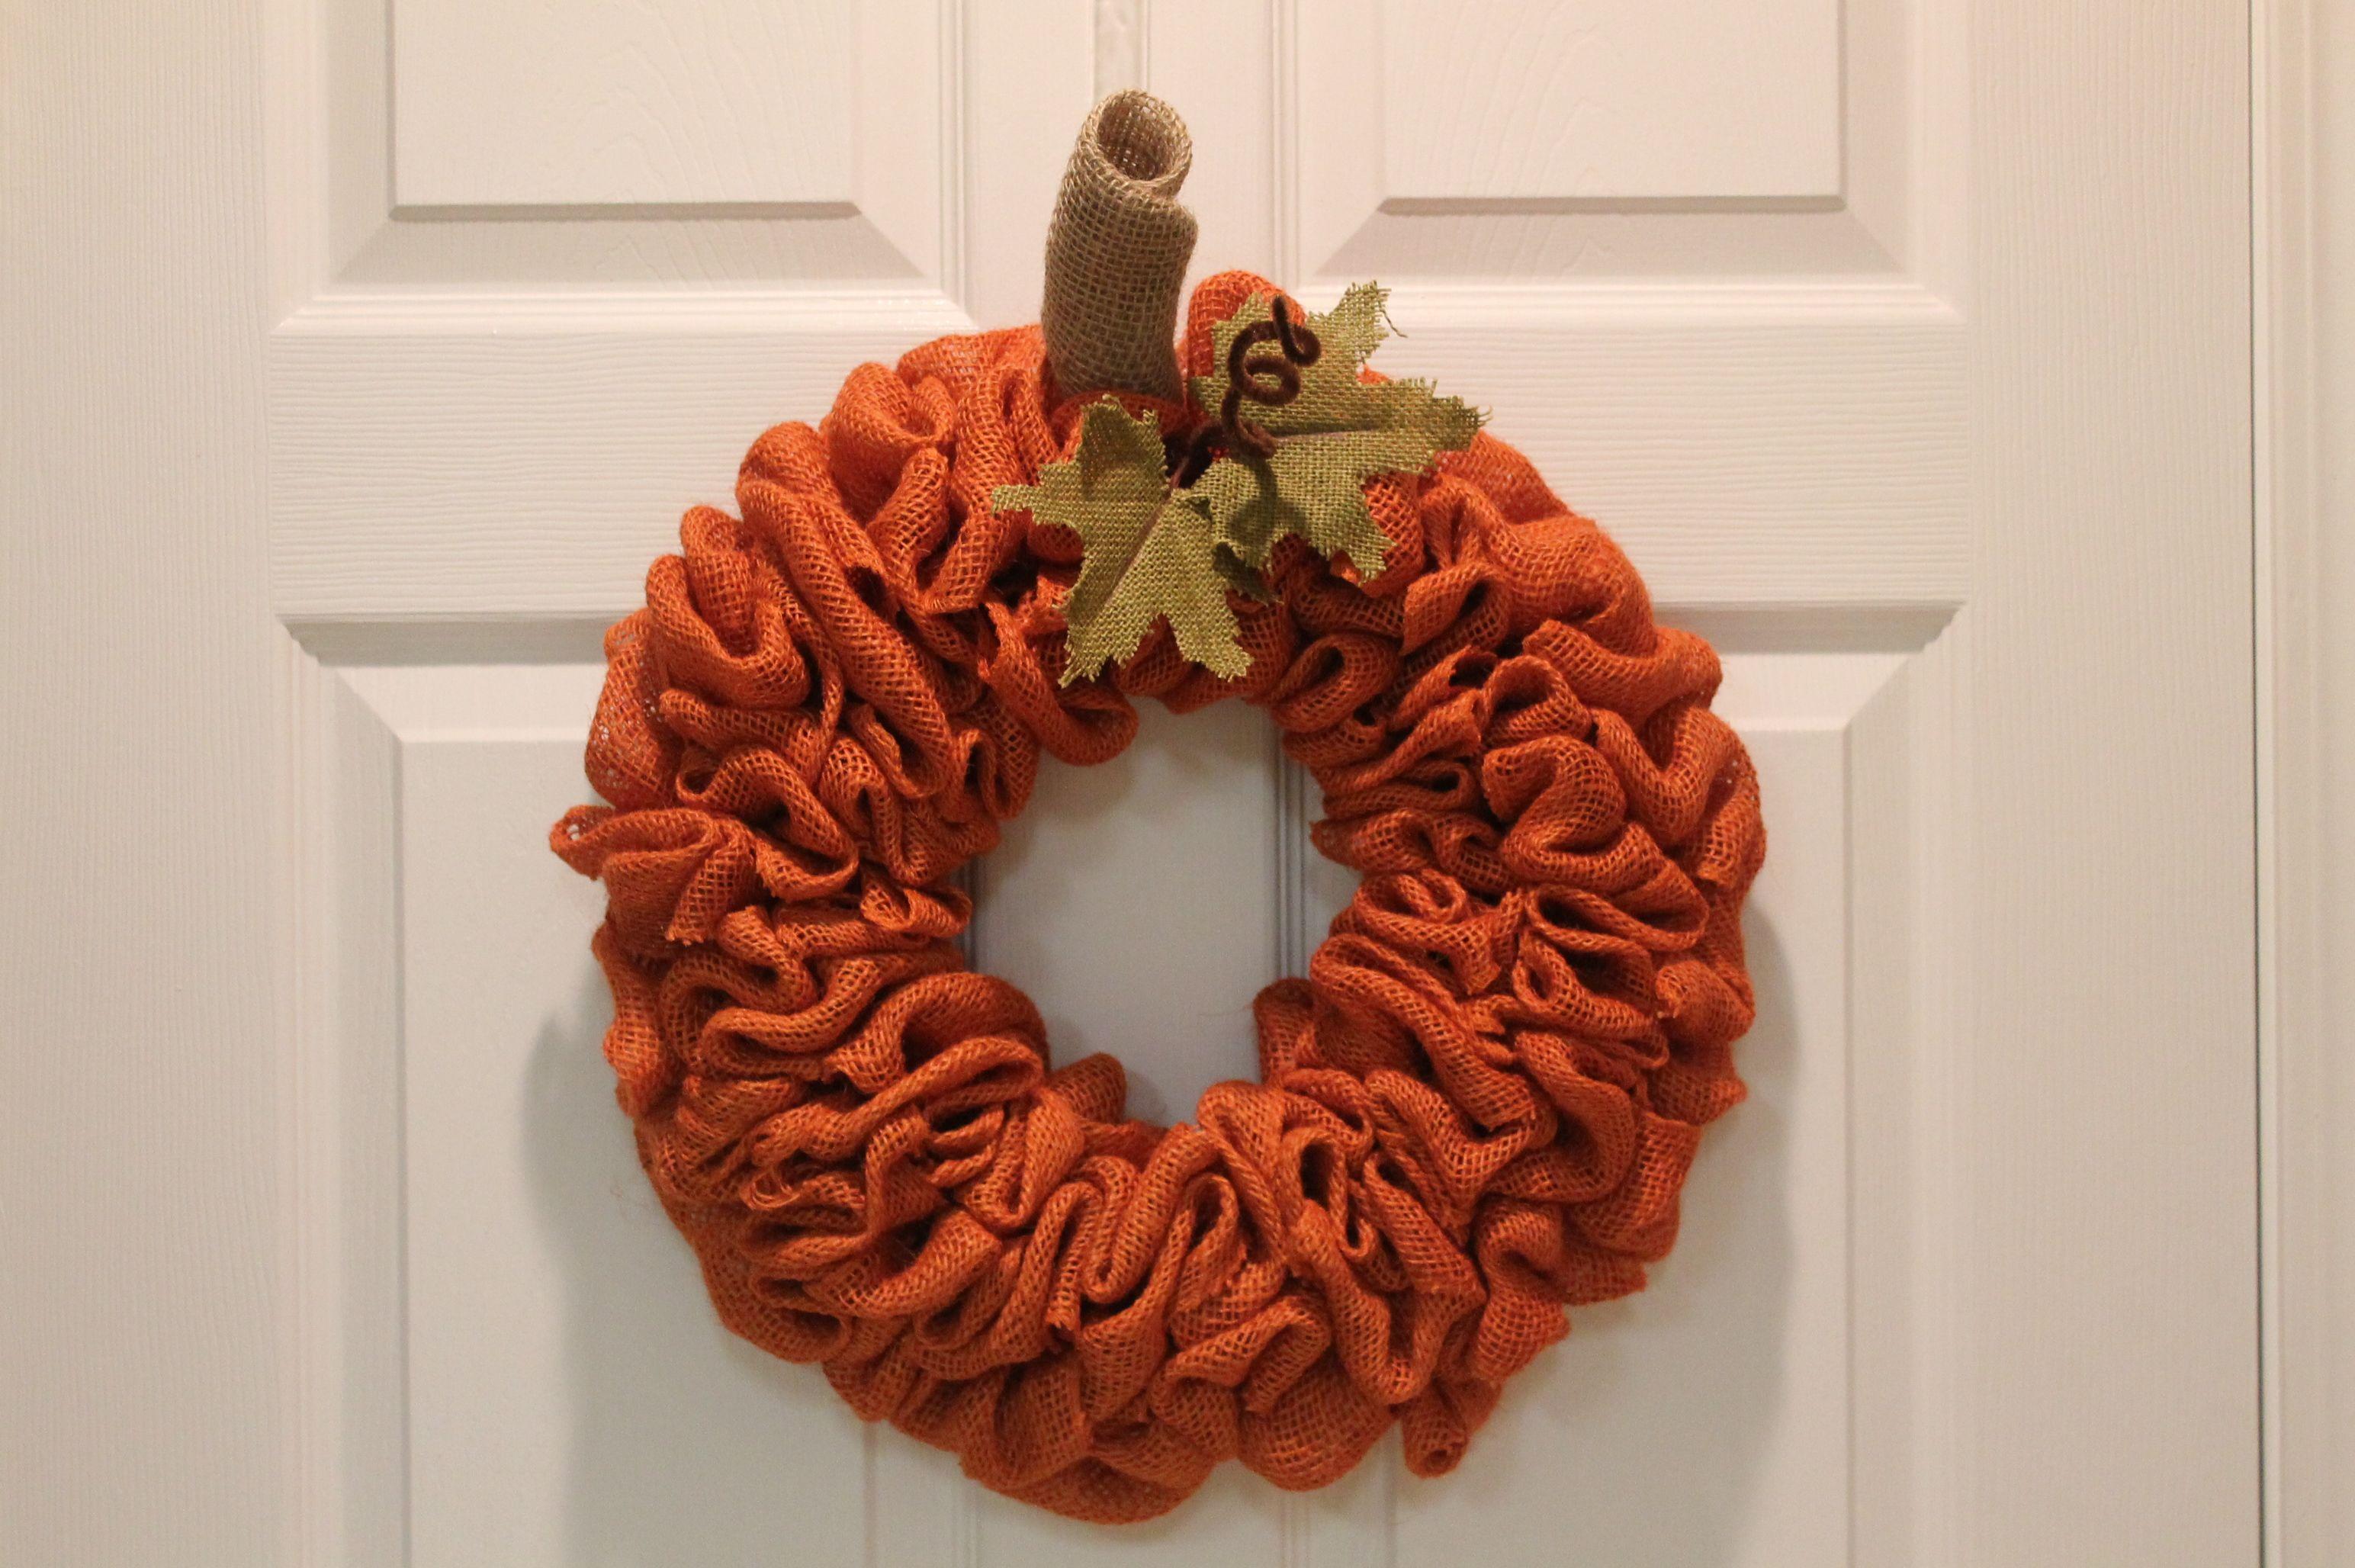 Diy Burlap Pumpkin Fall Wreath Pumpkin Wreath Diy Burlap Wreath Diy Burlap Pumpkins